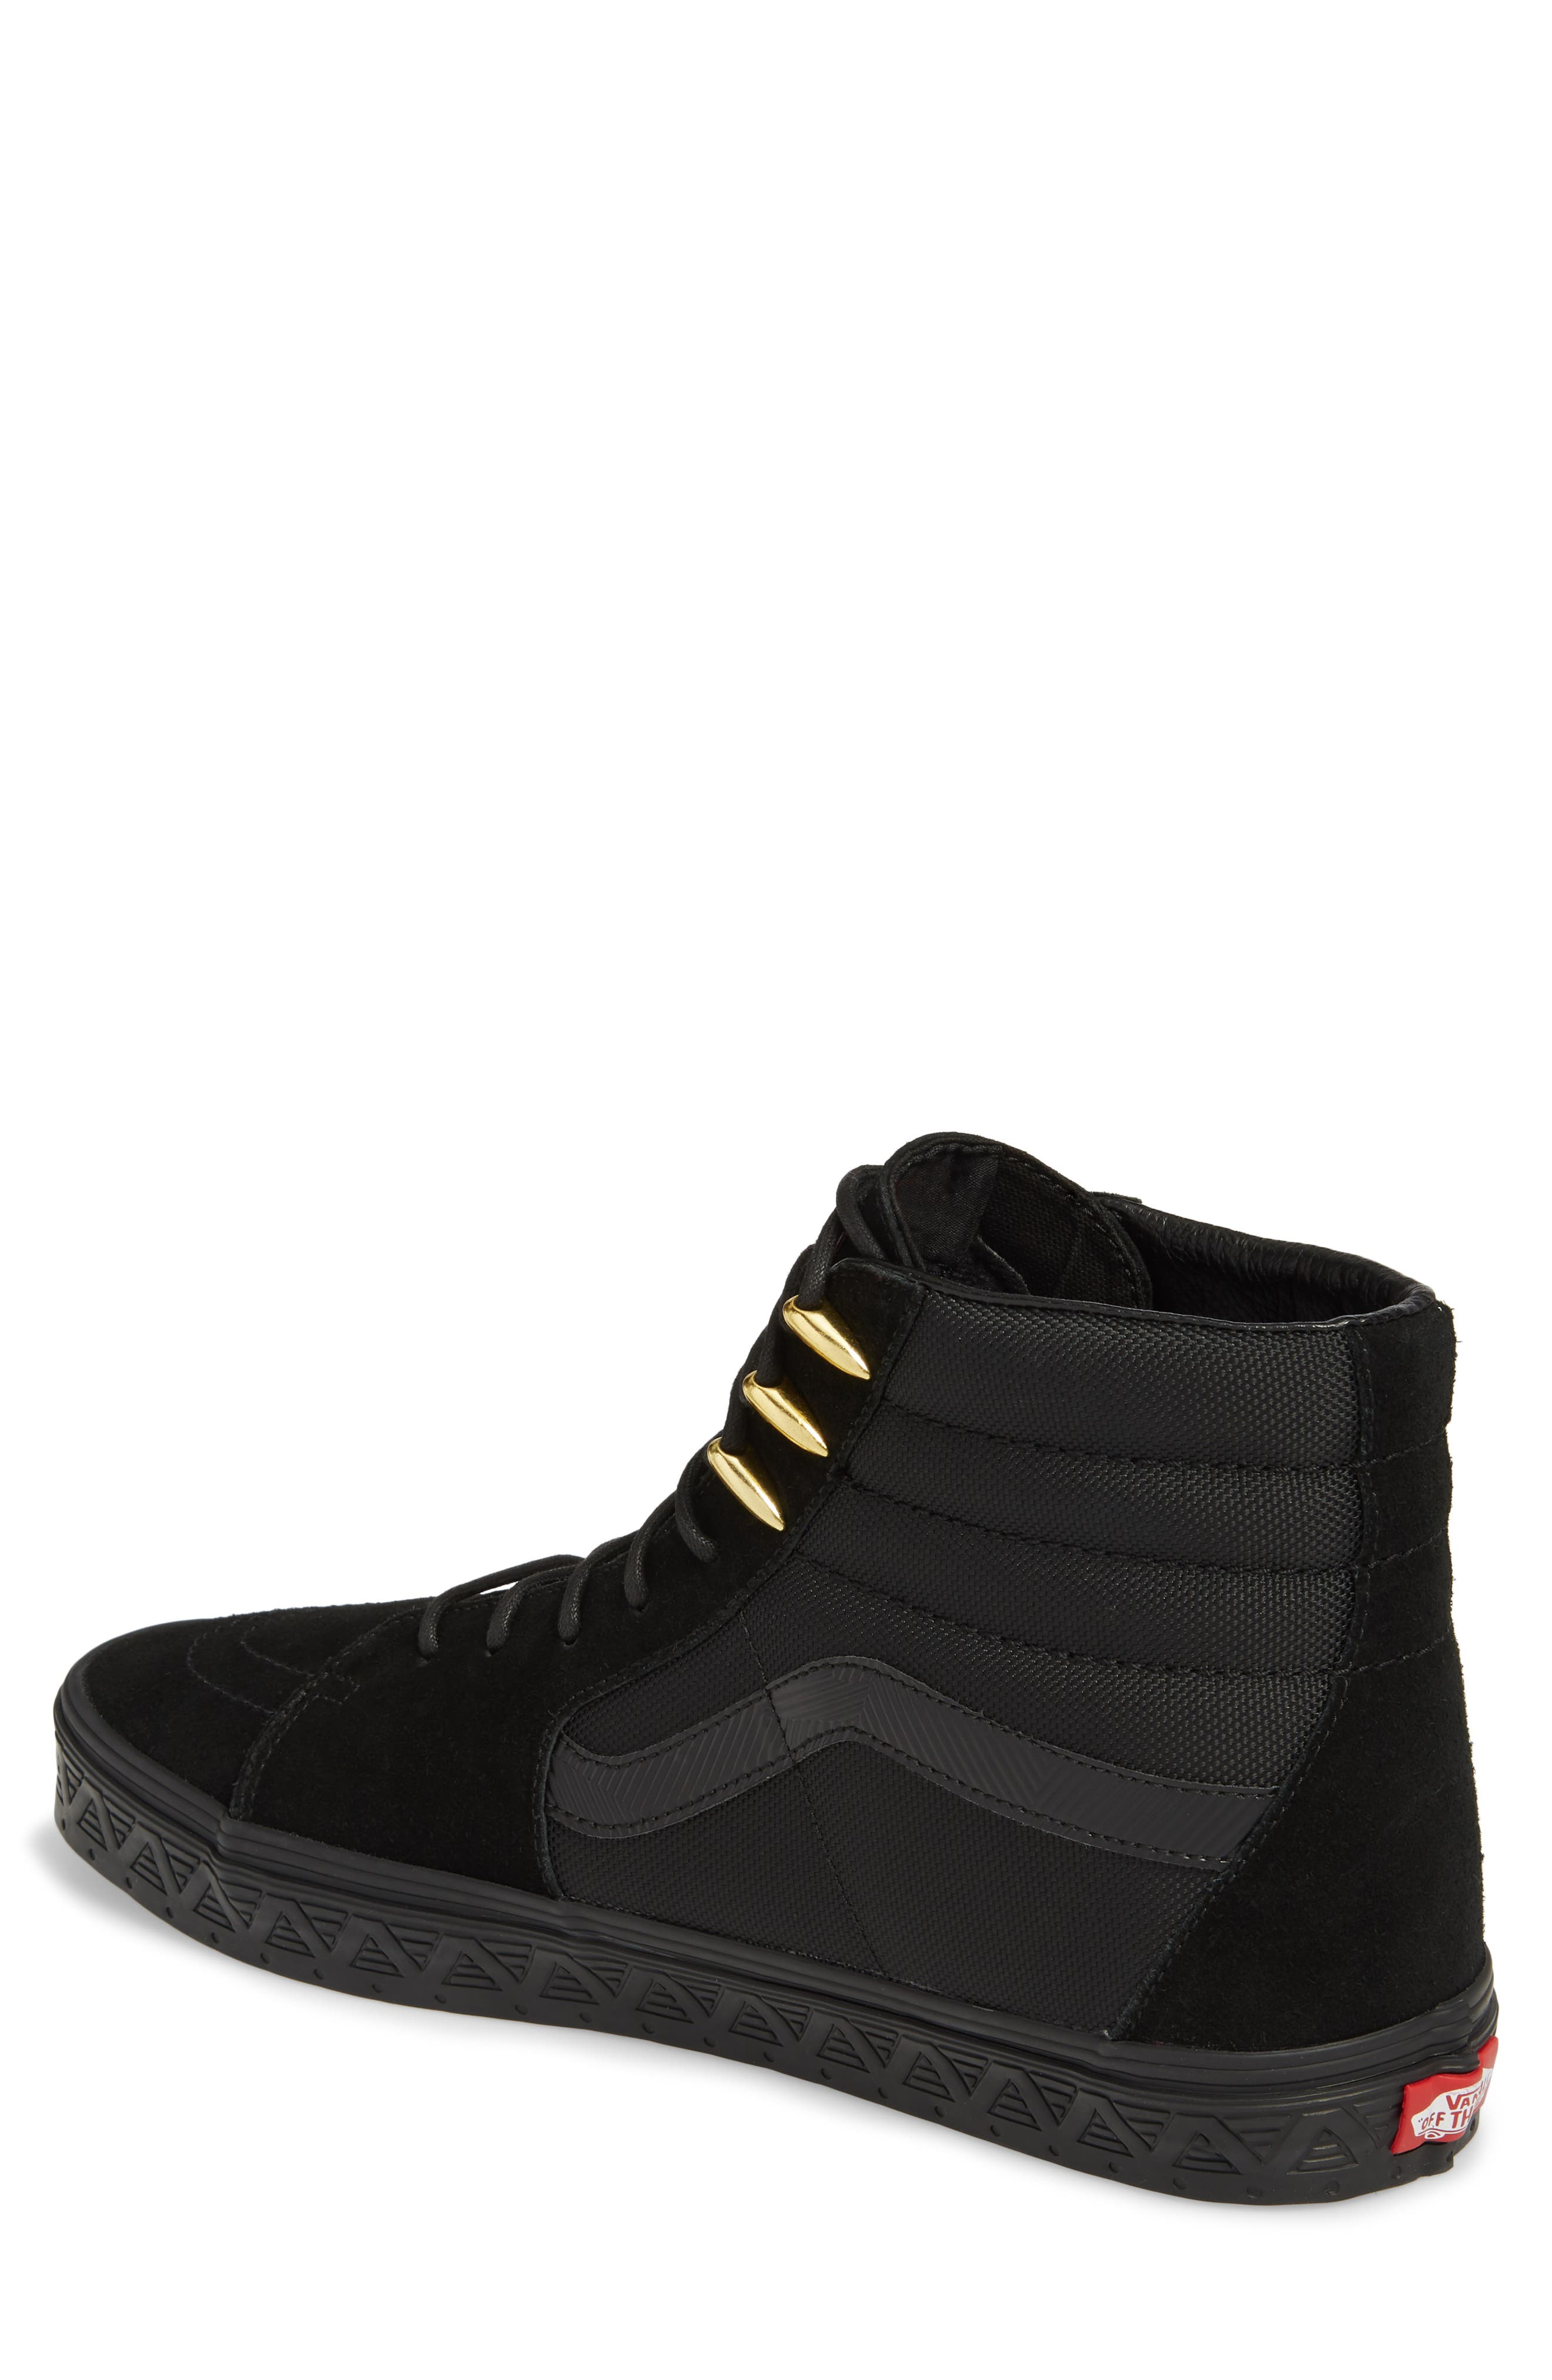 x Marvel<sup>®</sup> UA Sk8-Hi Sneaker,                             Alternate thumbnail 3, color,